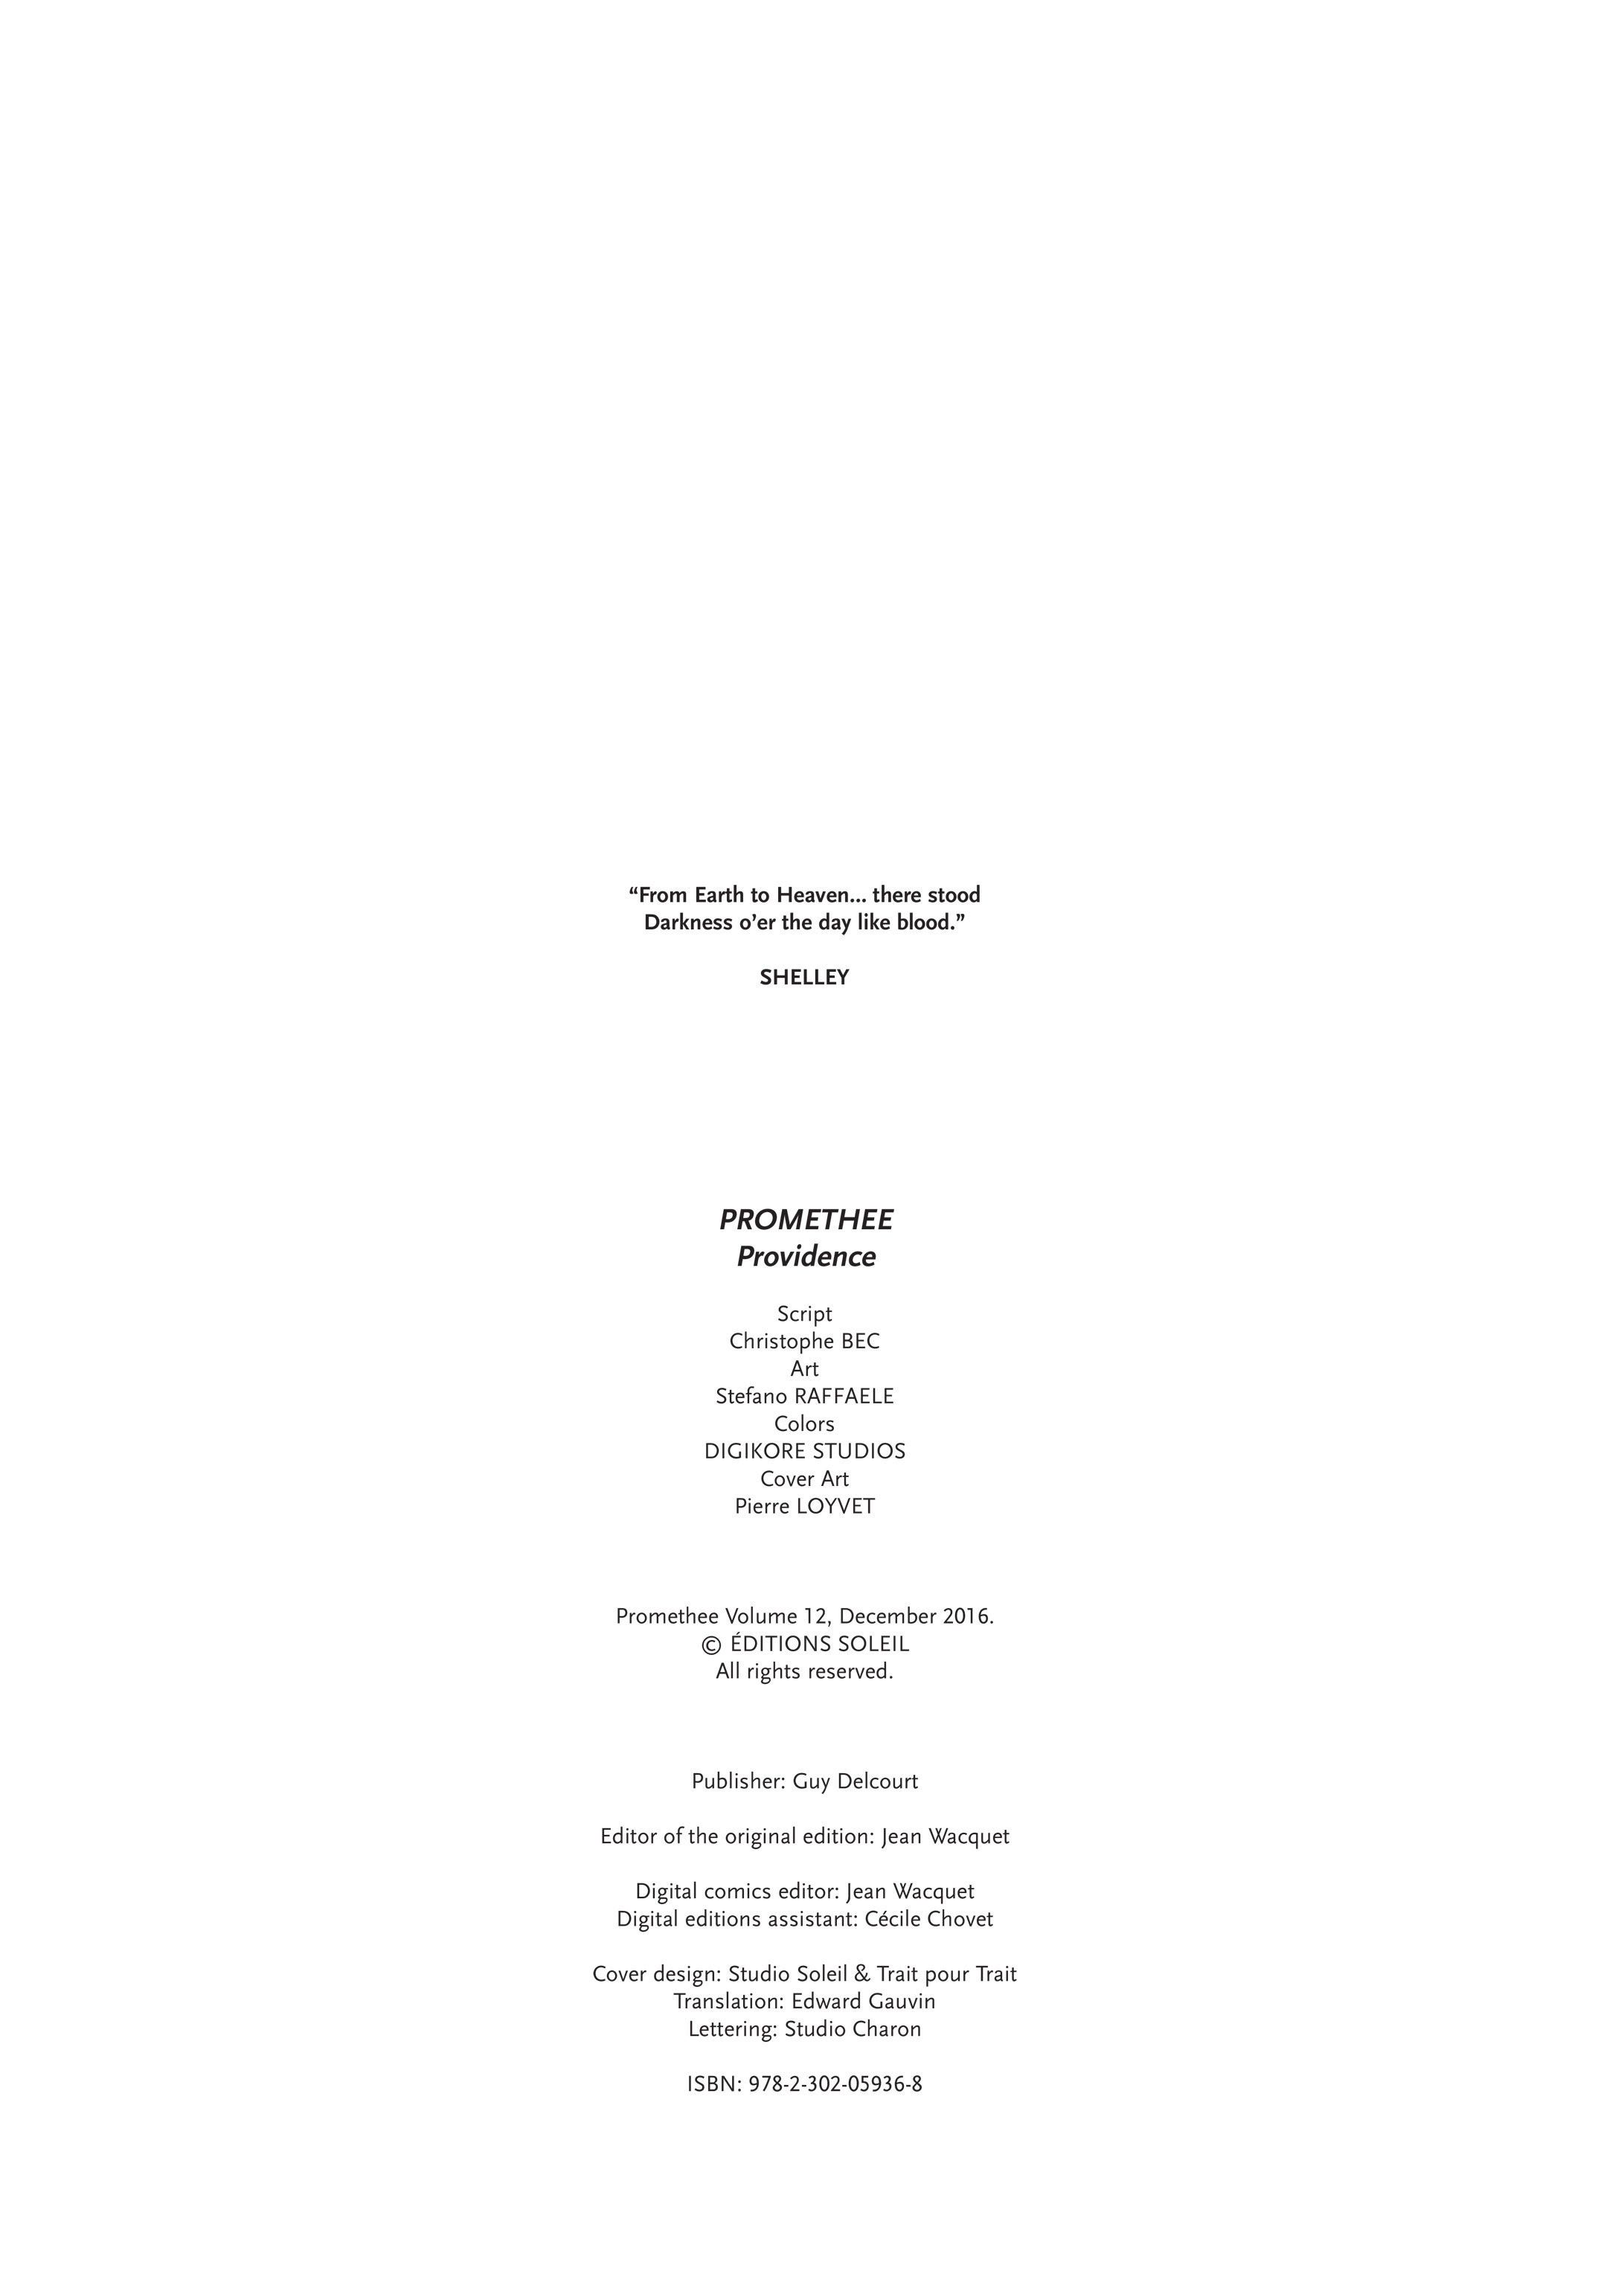 Promethee #12 #8 - English 2